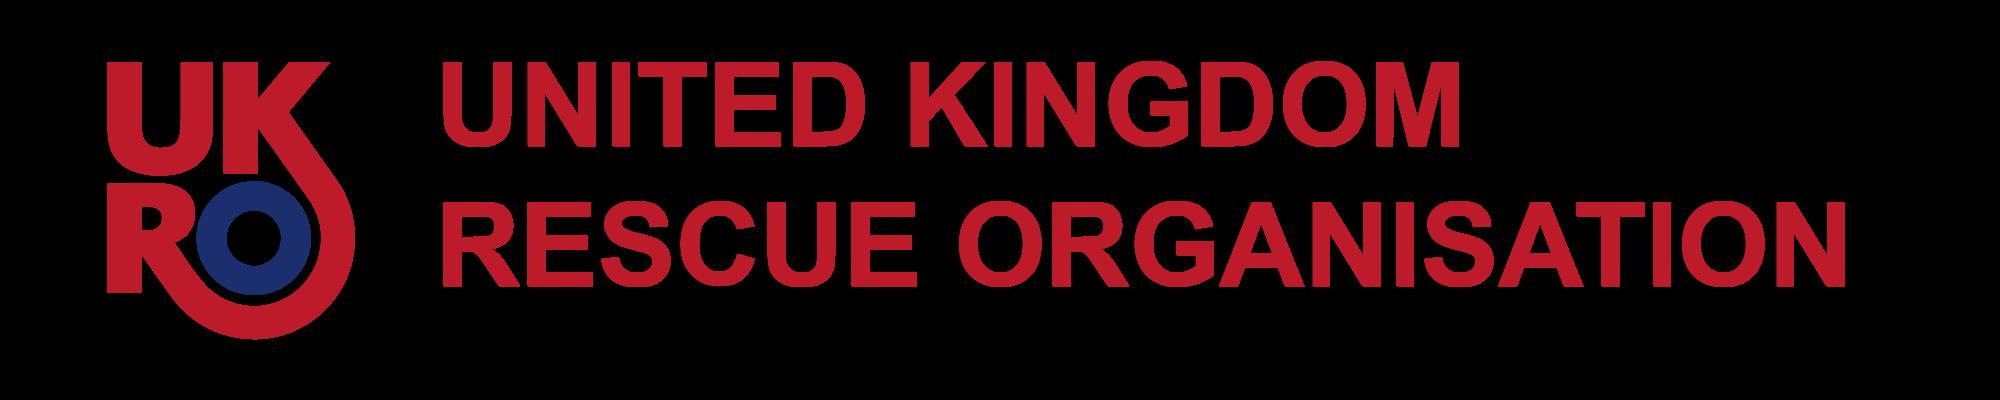 UNITED KINGDOM RESCUE ORGANISATION